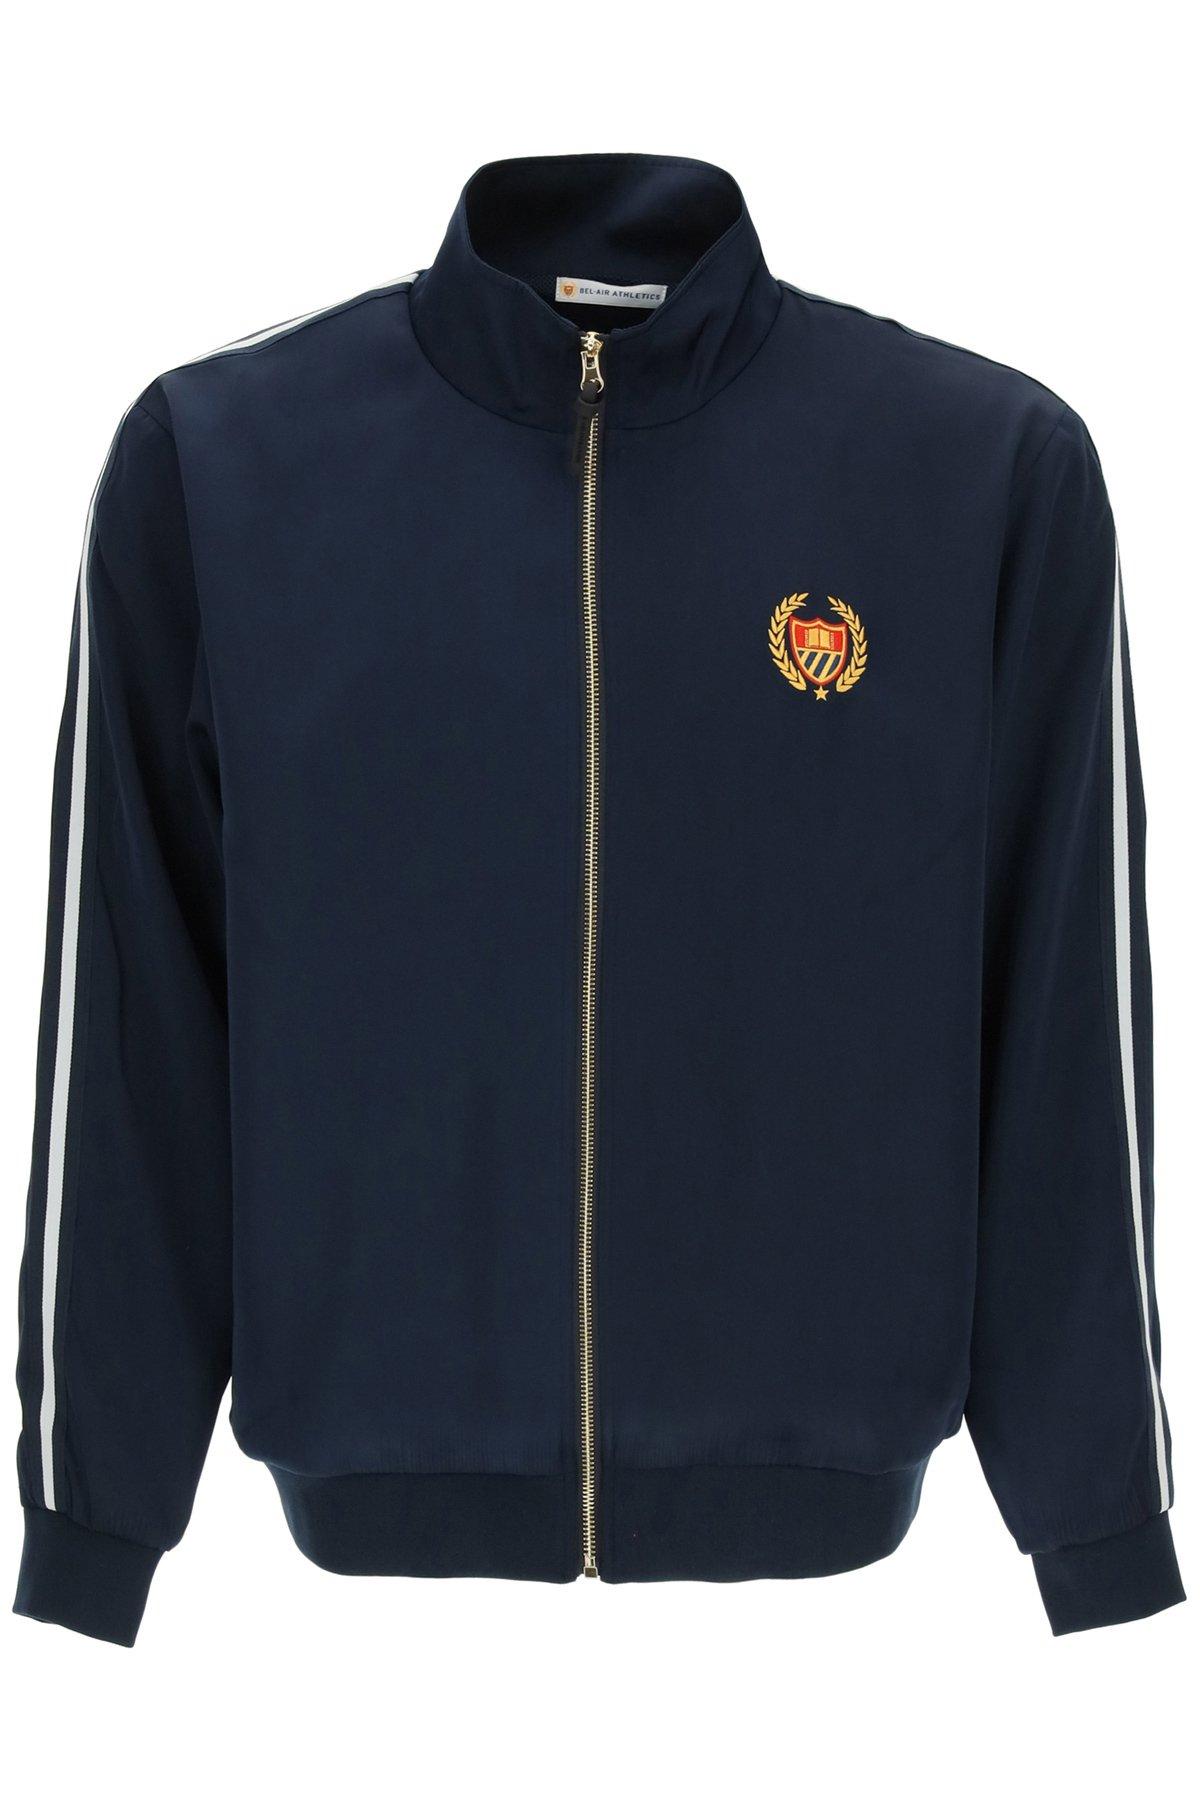 Bel-air athletics track jacket